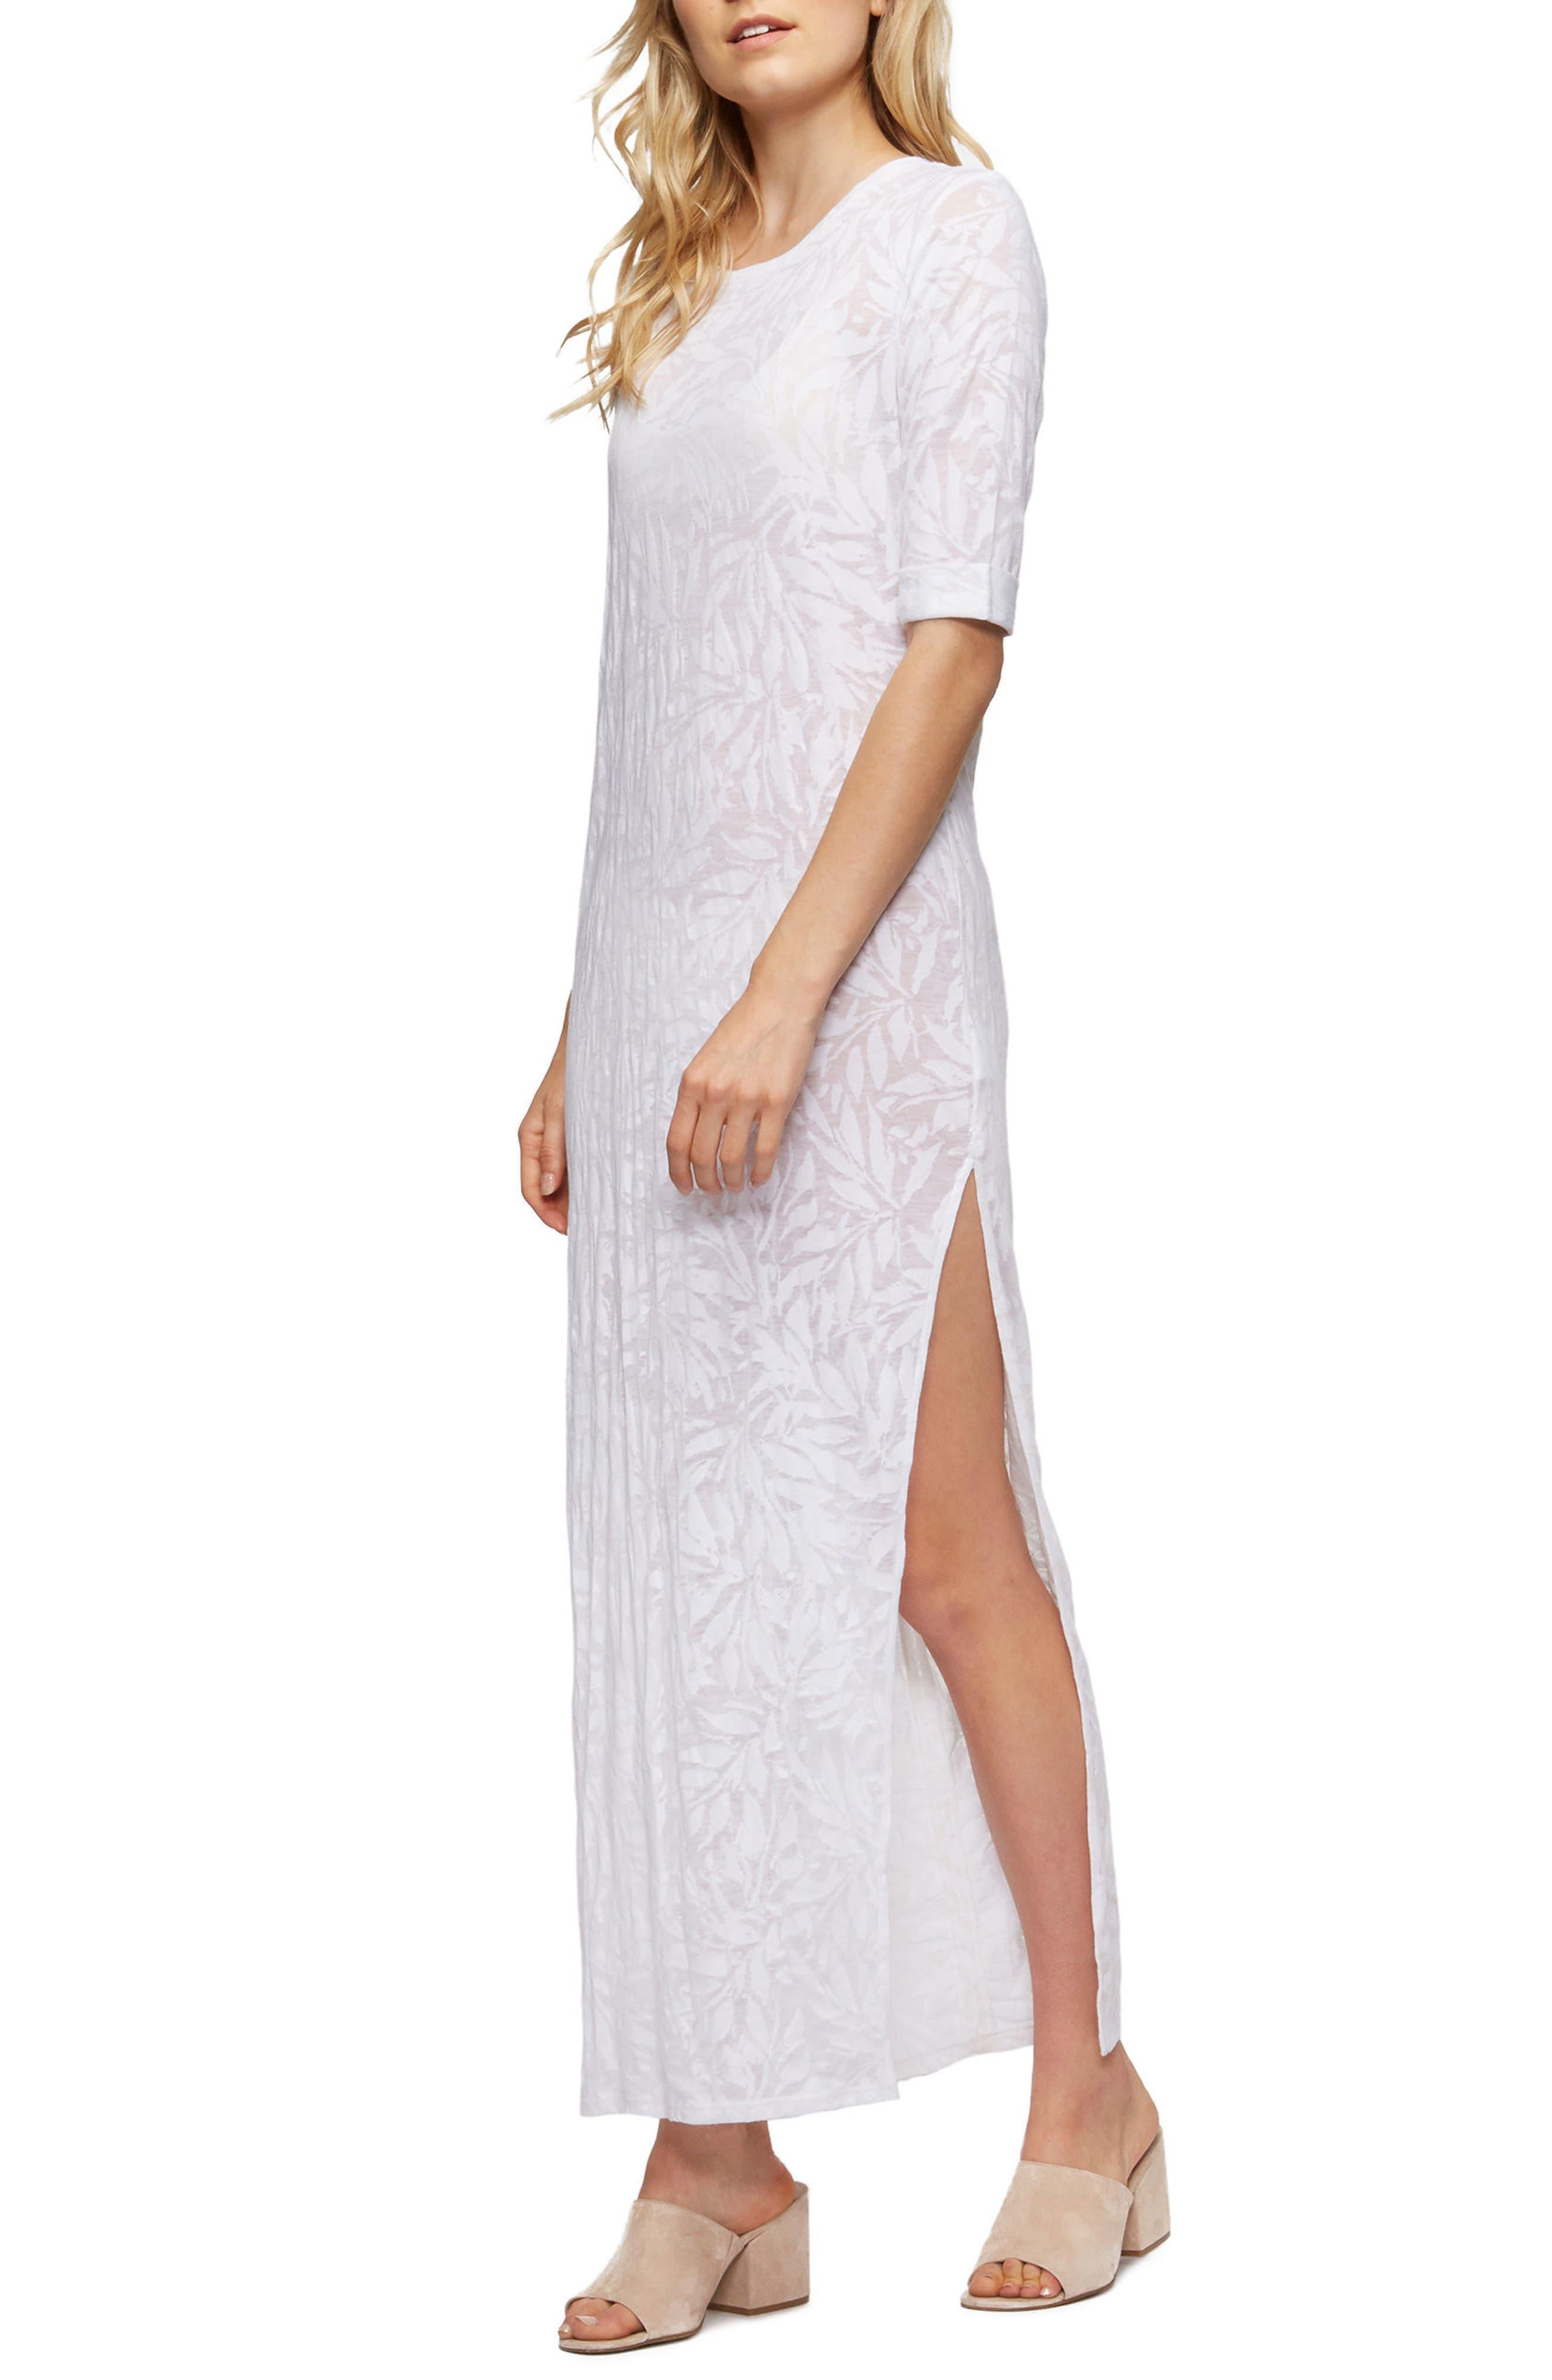 Finn Cover-Up Maxi Dress,                             Alternate thumbnail 6, color,